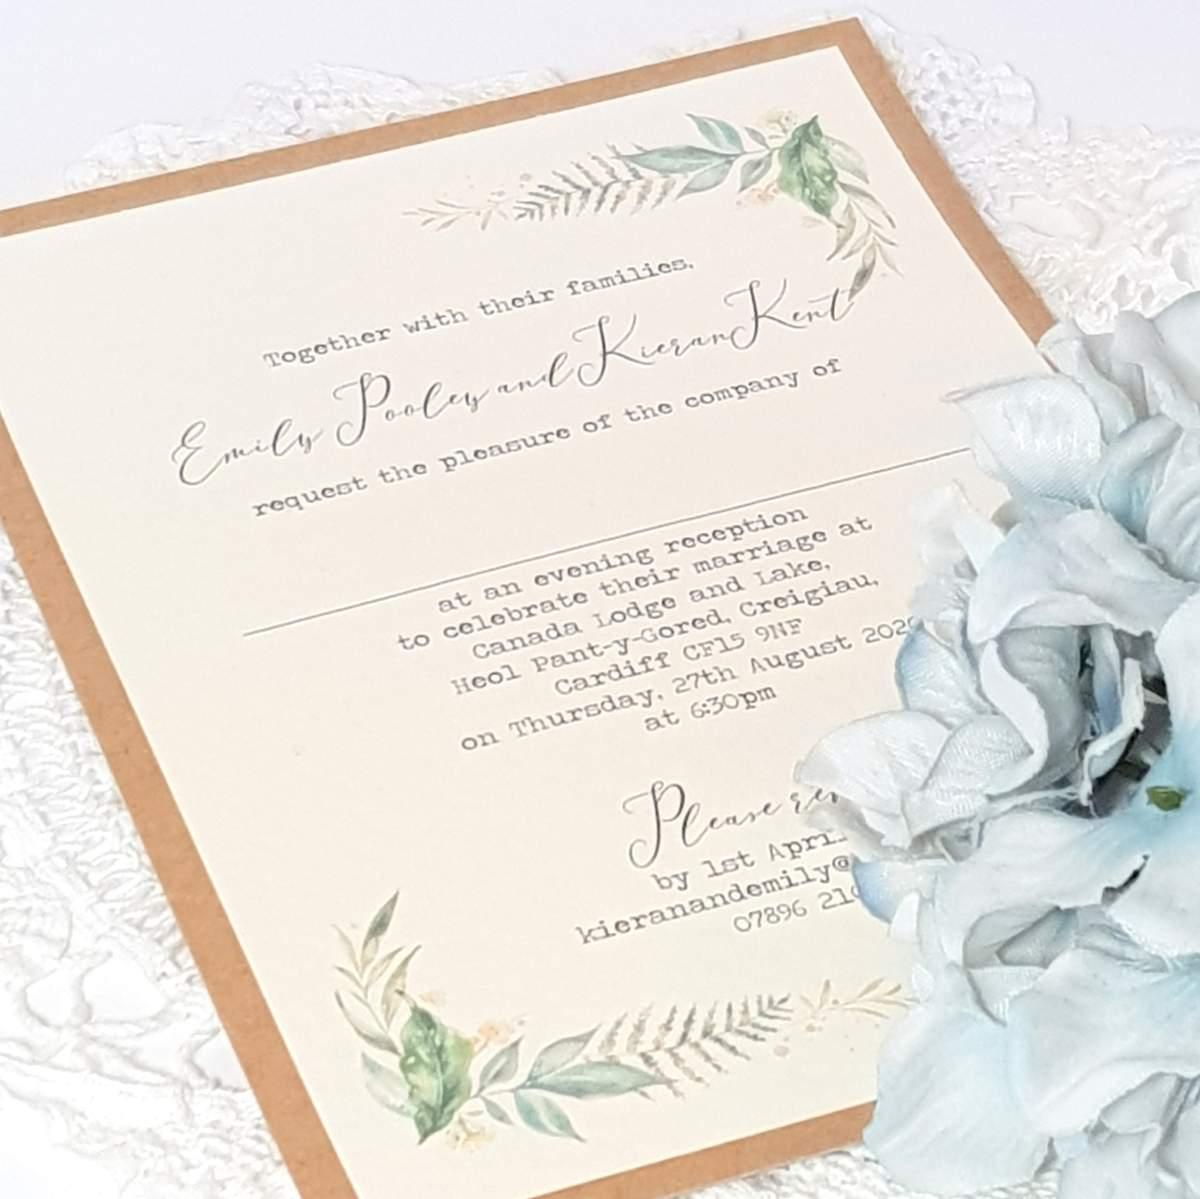 evening invitation with woodland foliage design